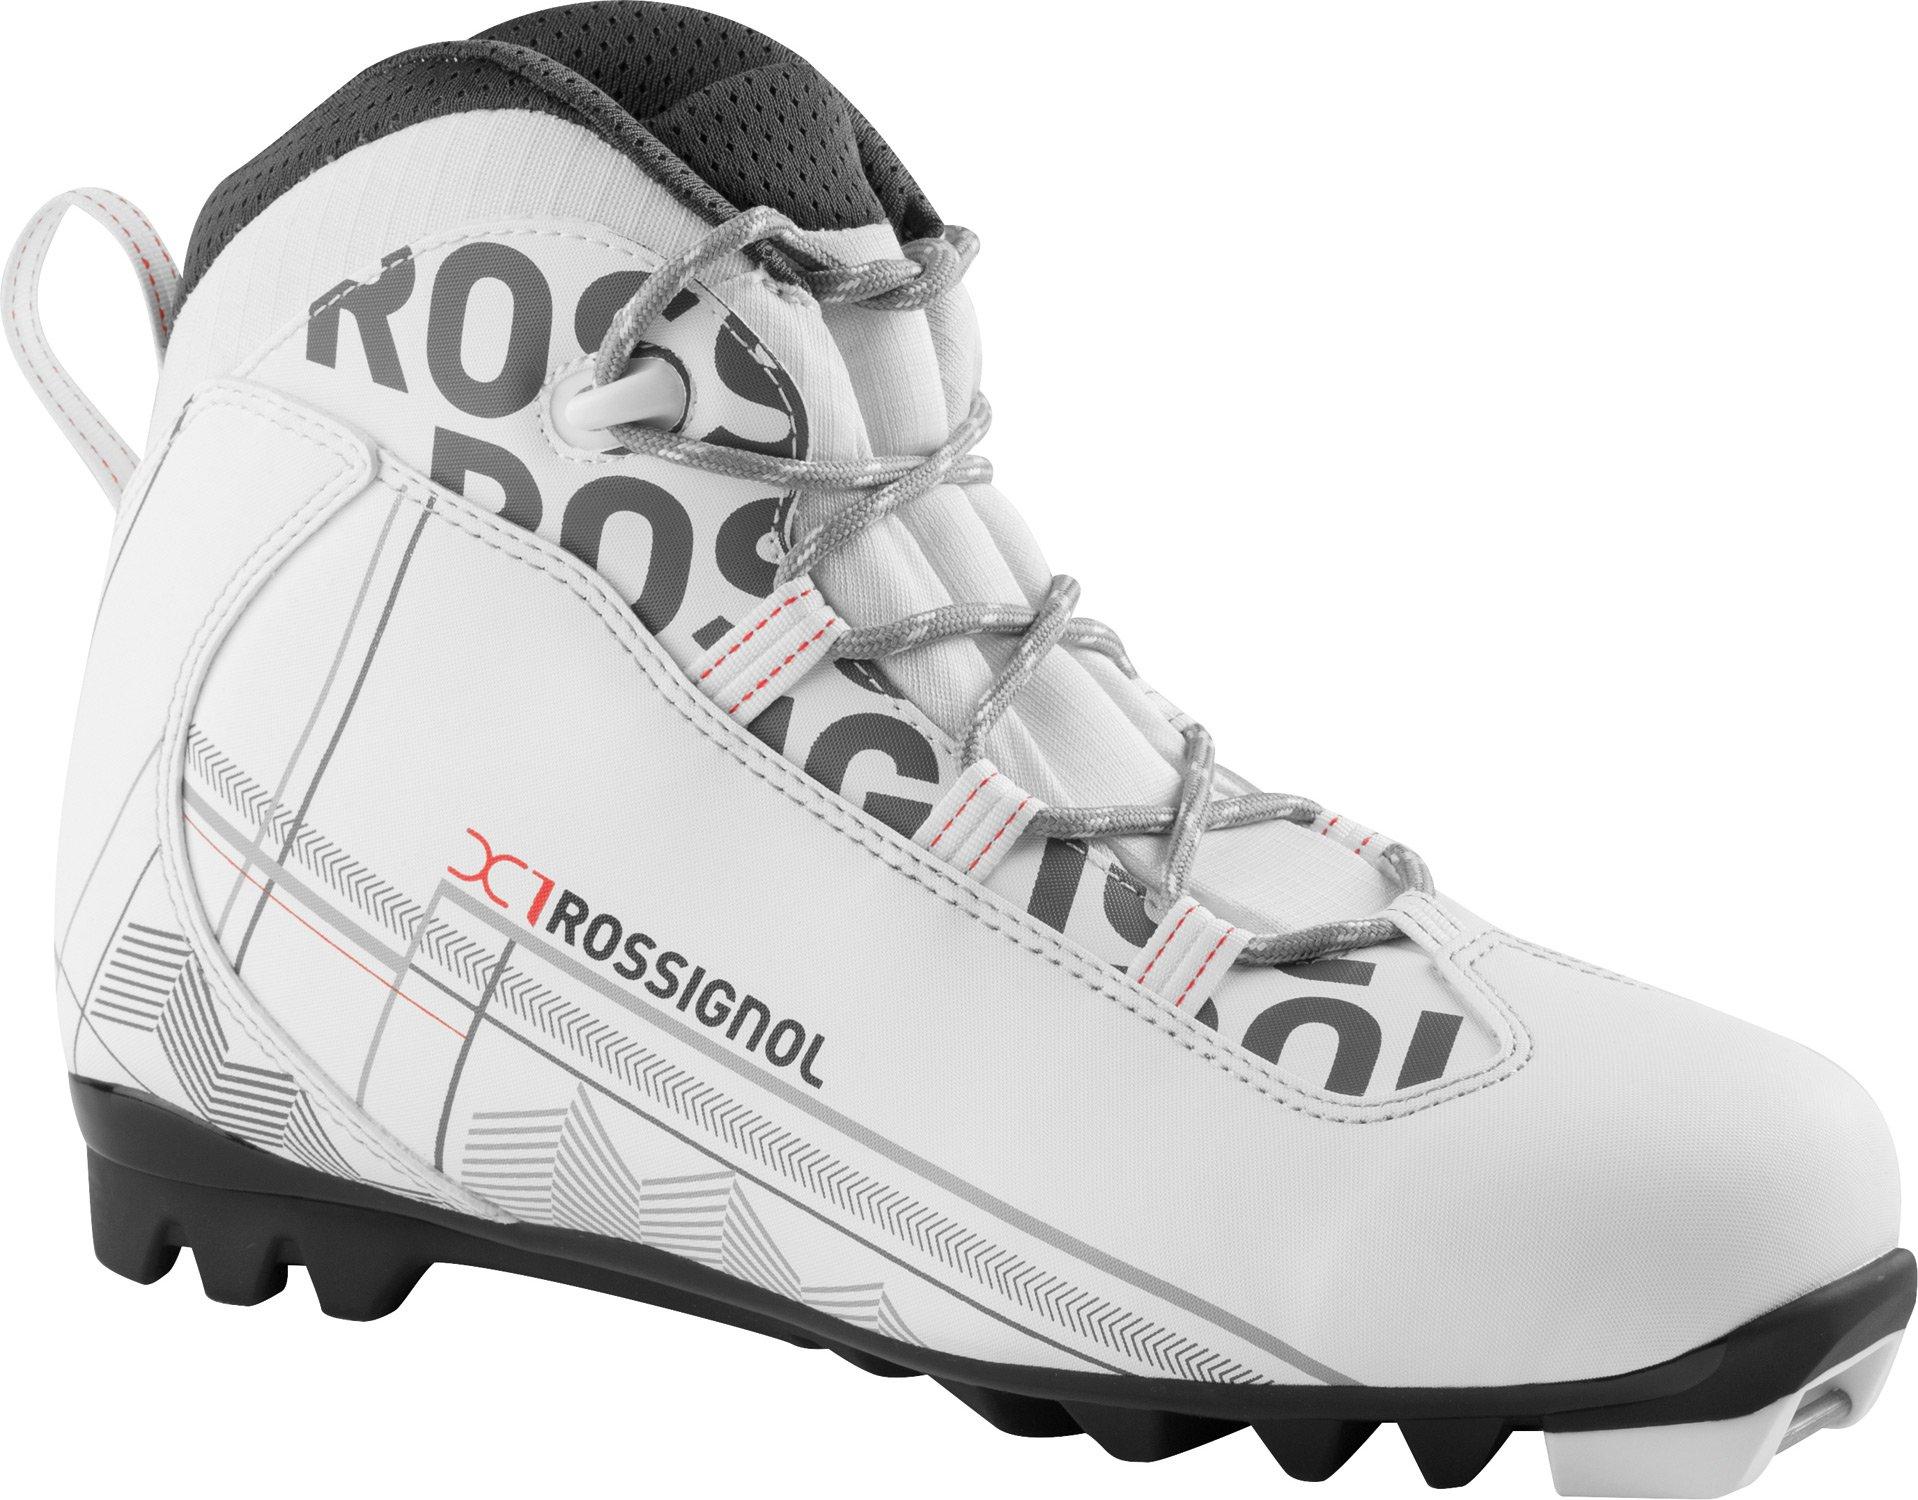 Rossignol X-1 FW XC Ski Boots Womens Sz 7.5 (39) by Rossignol